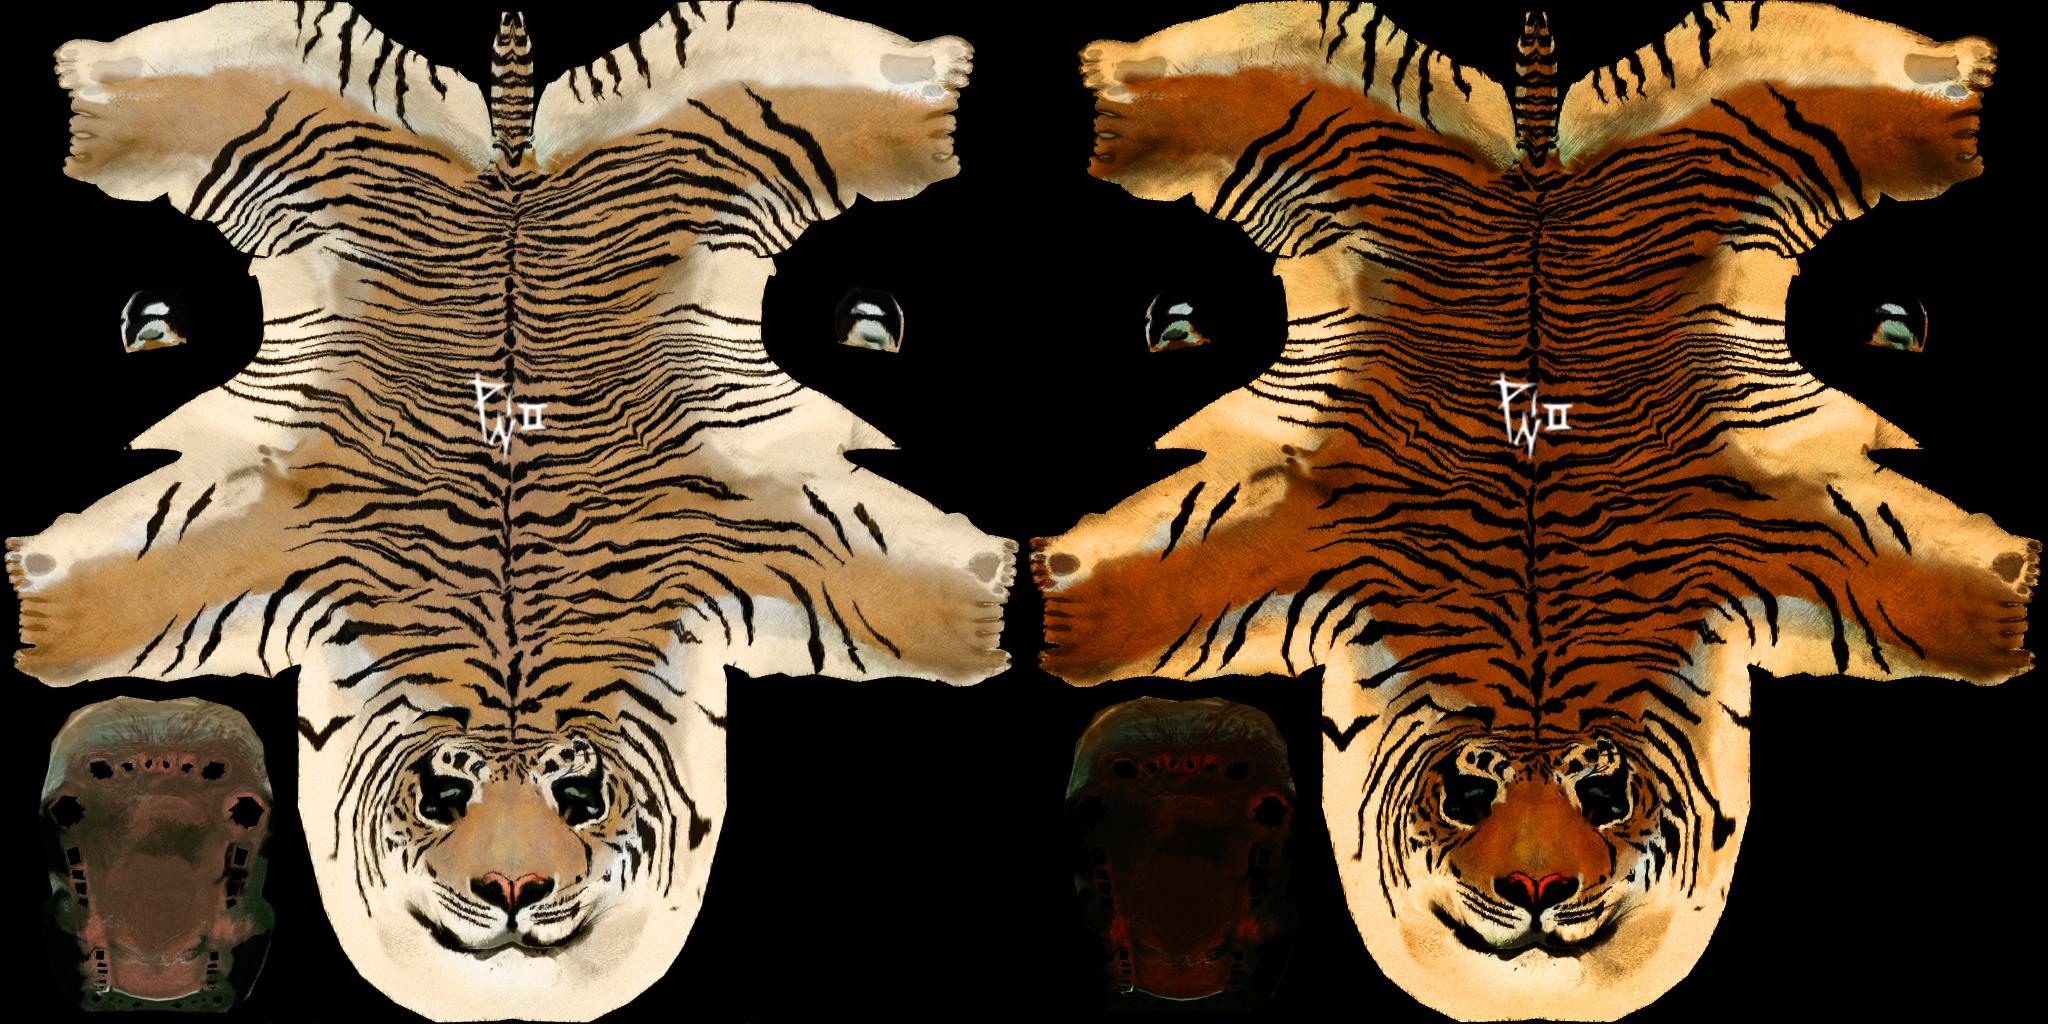 Uv maling tiger